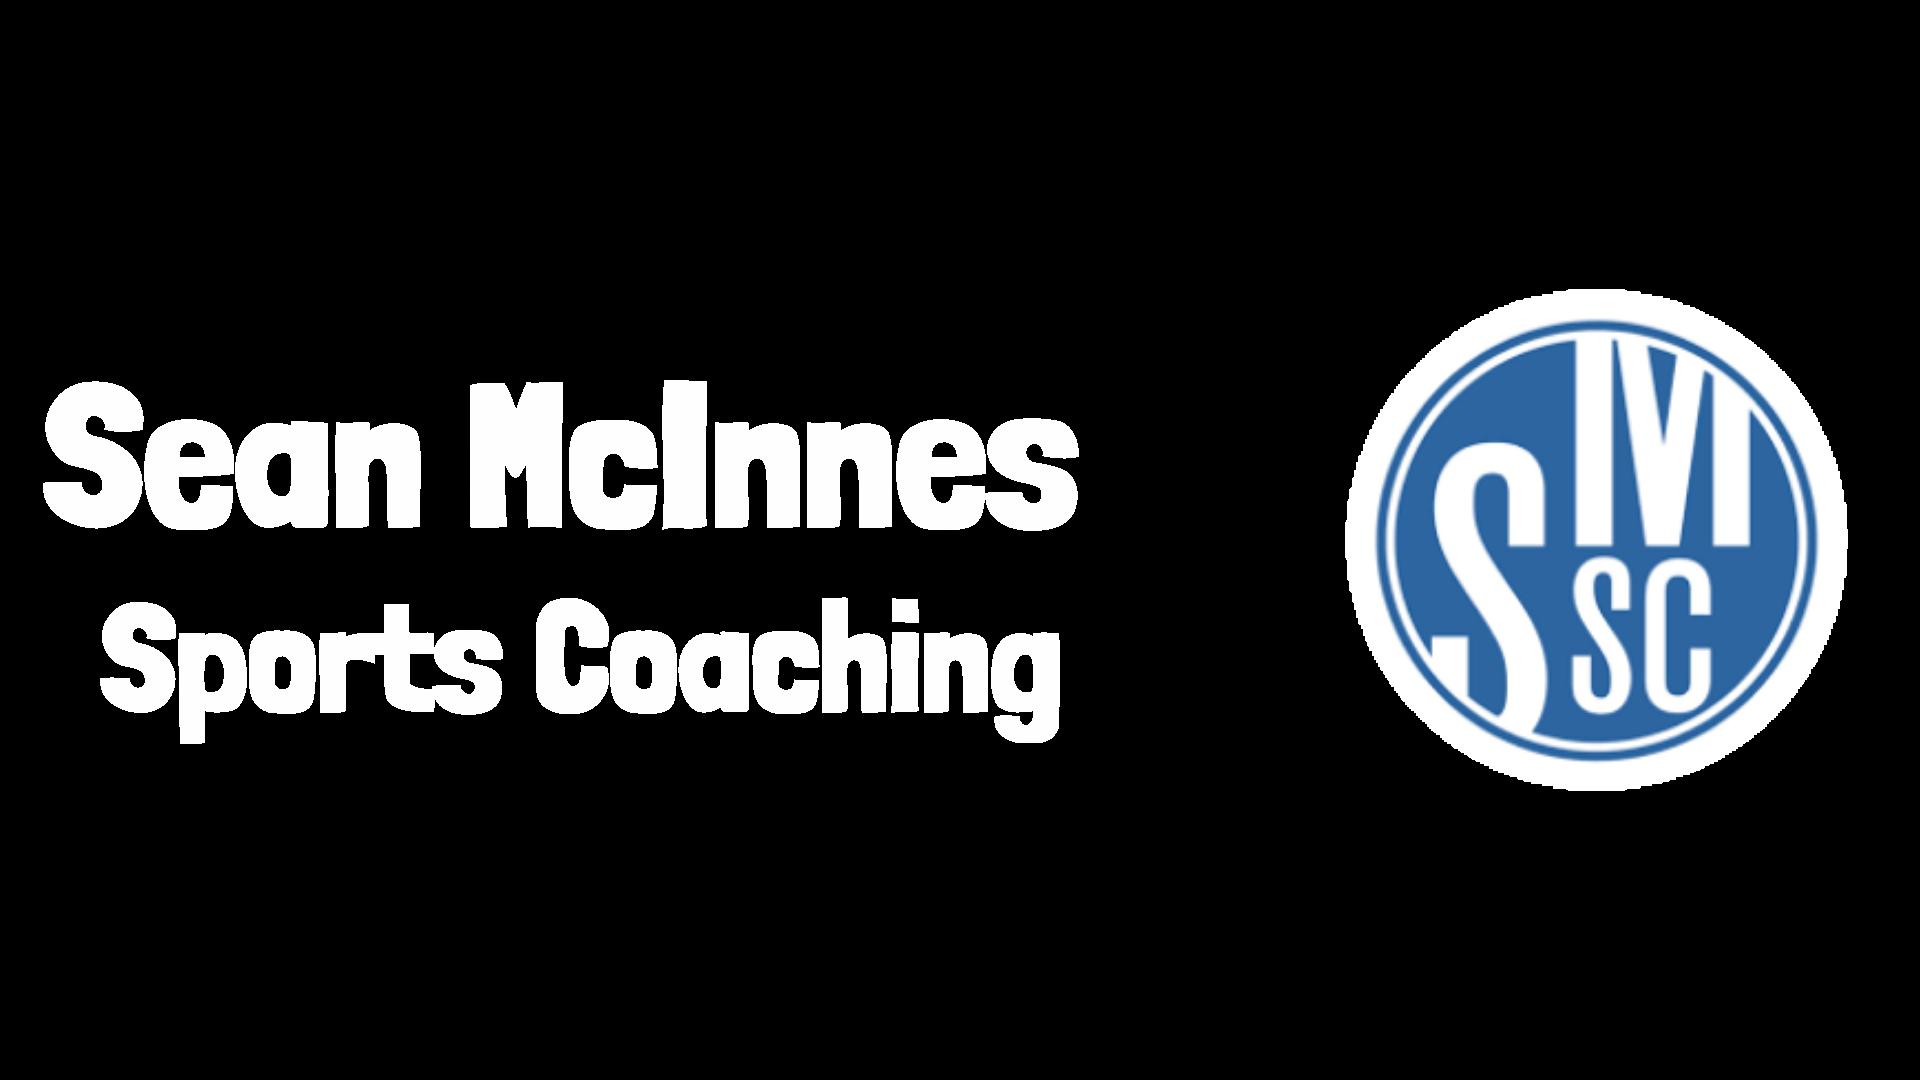 Sean Mcinnes Sports Coaching